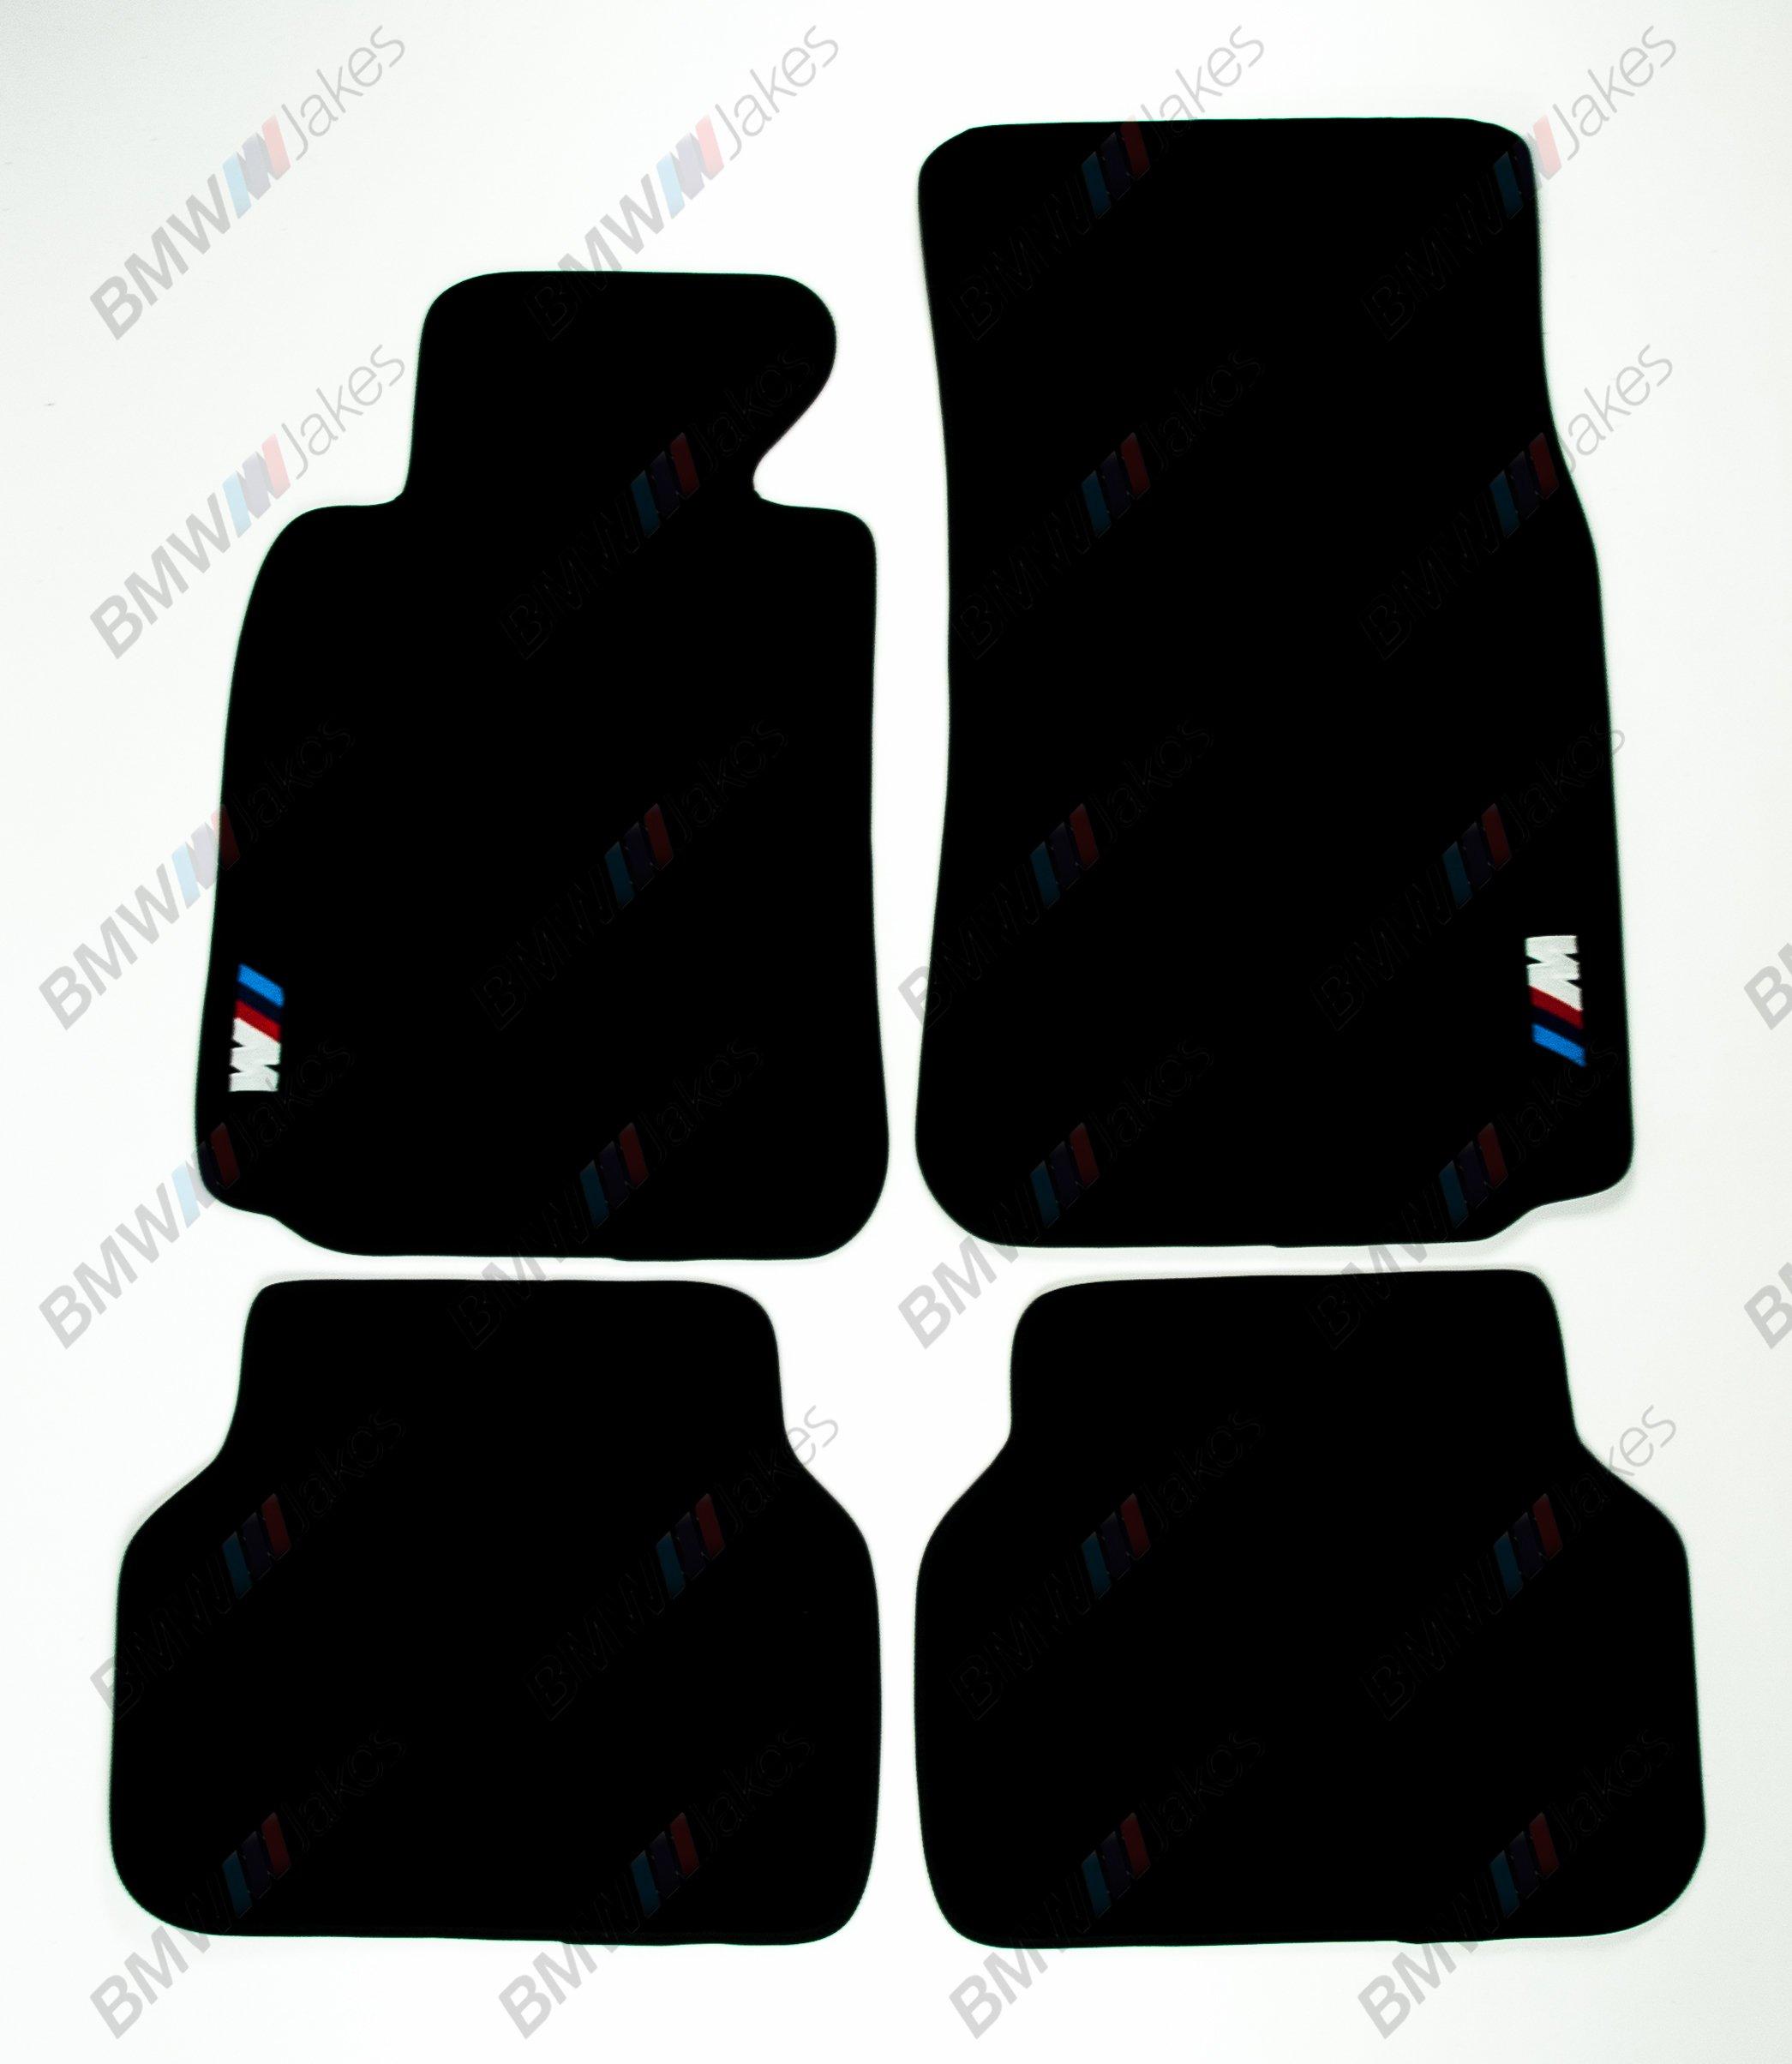 NEW CAR FLOOR MATS BLACK with ///M EMBLEM for BMW 5 series E39 1996 - 2003